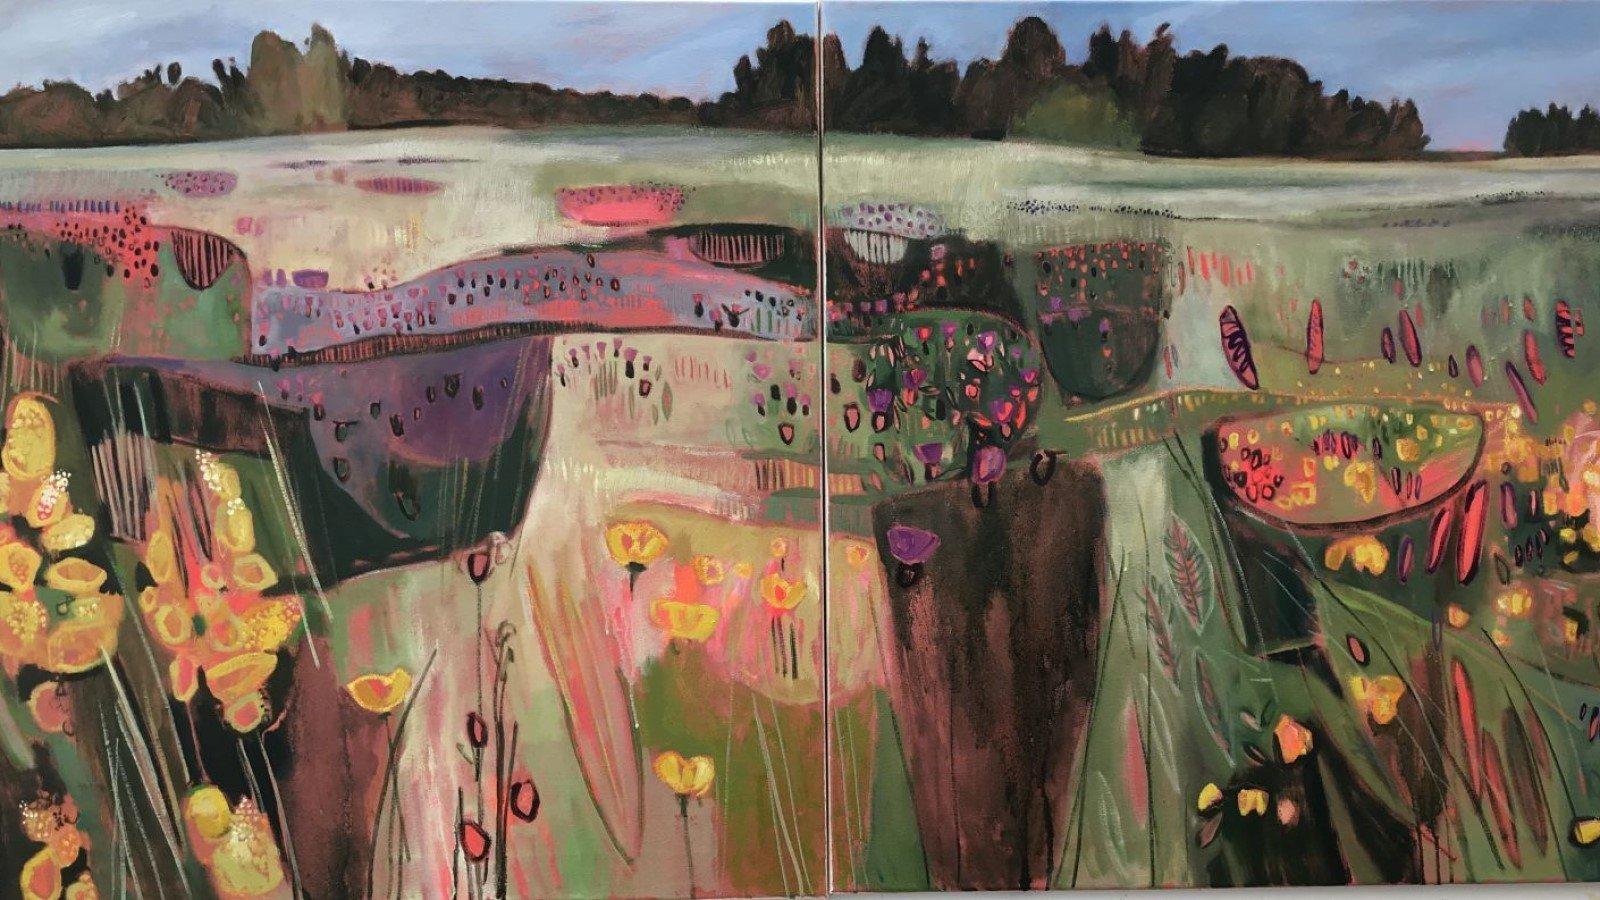 Elaine Kazimierczuk: Re-Fresh at The North Wall Gallery